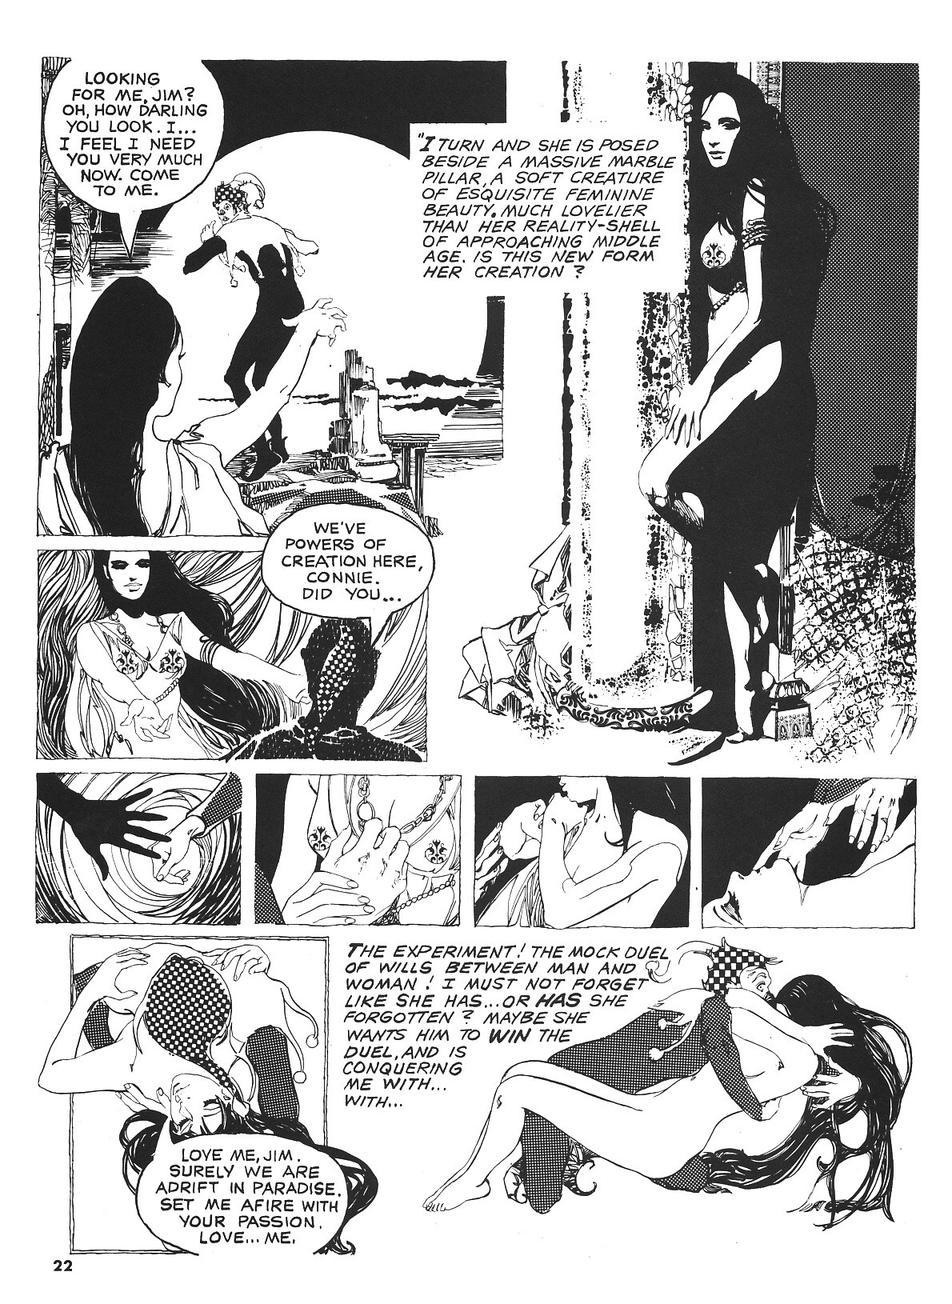 Maroto is a Spanish comics